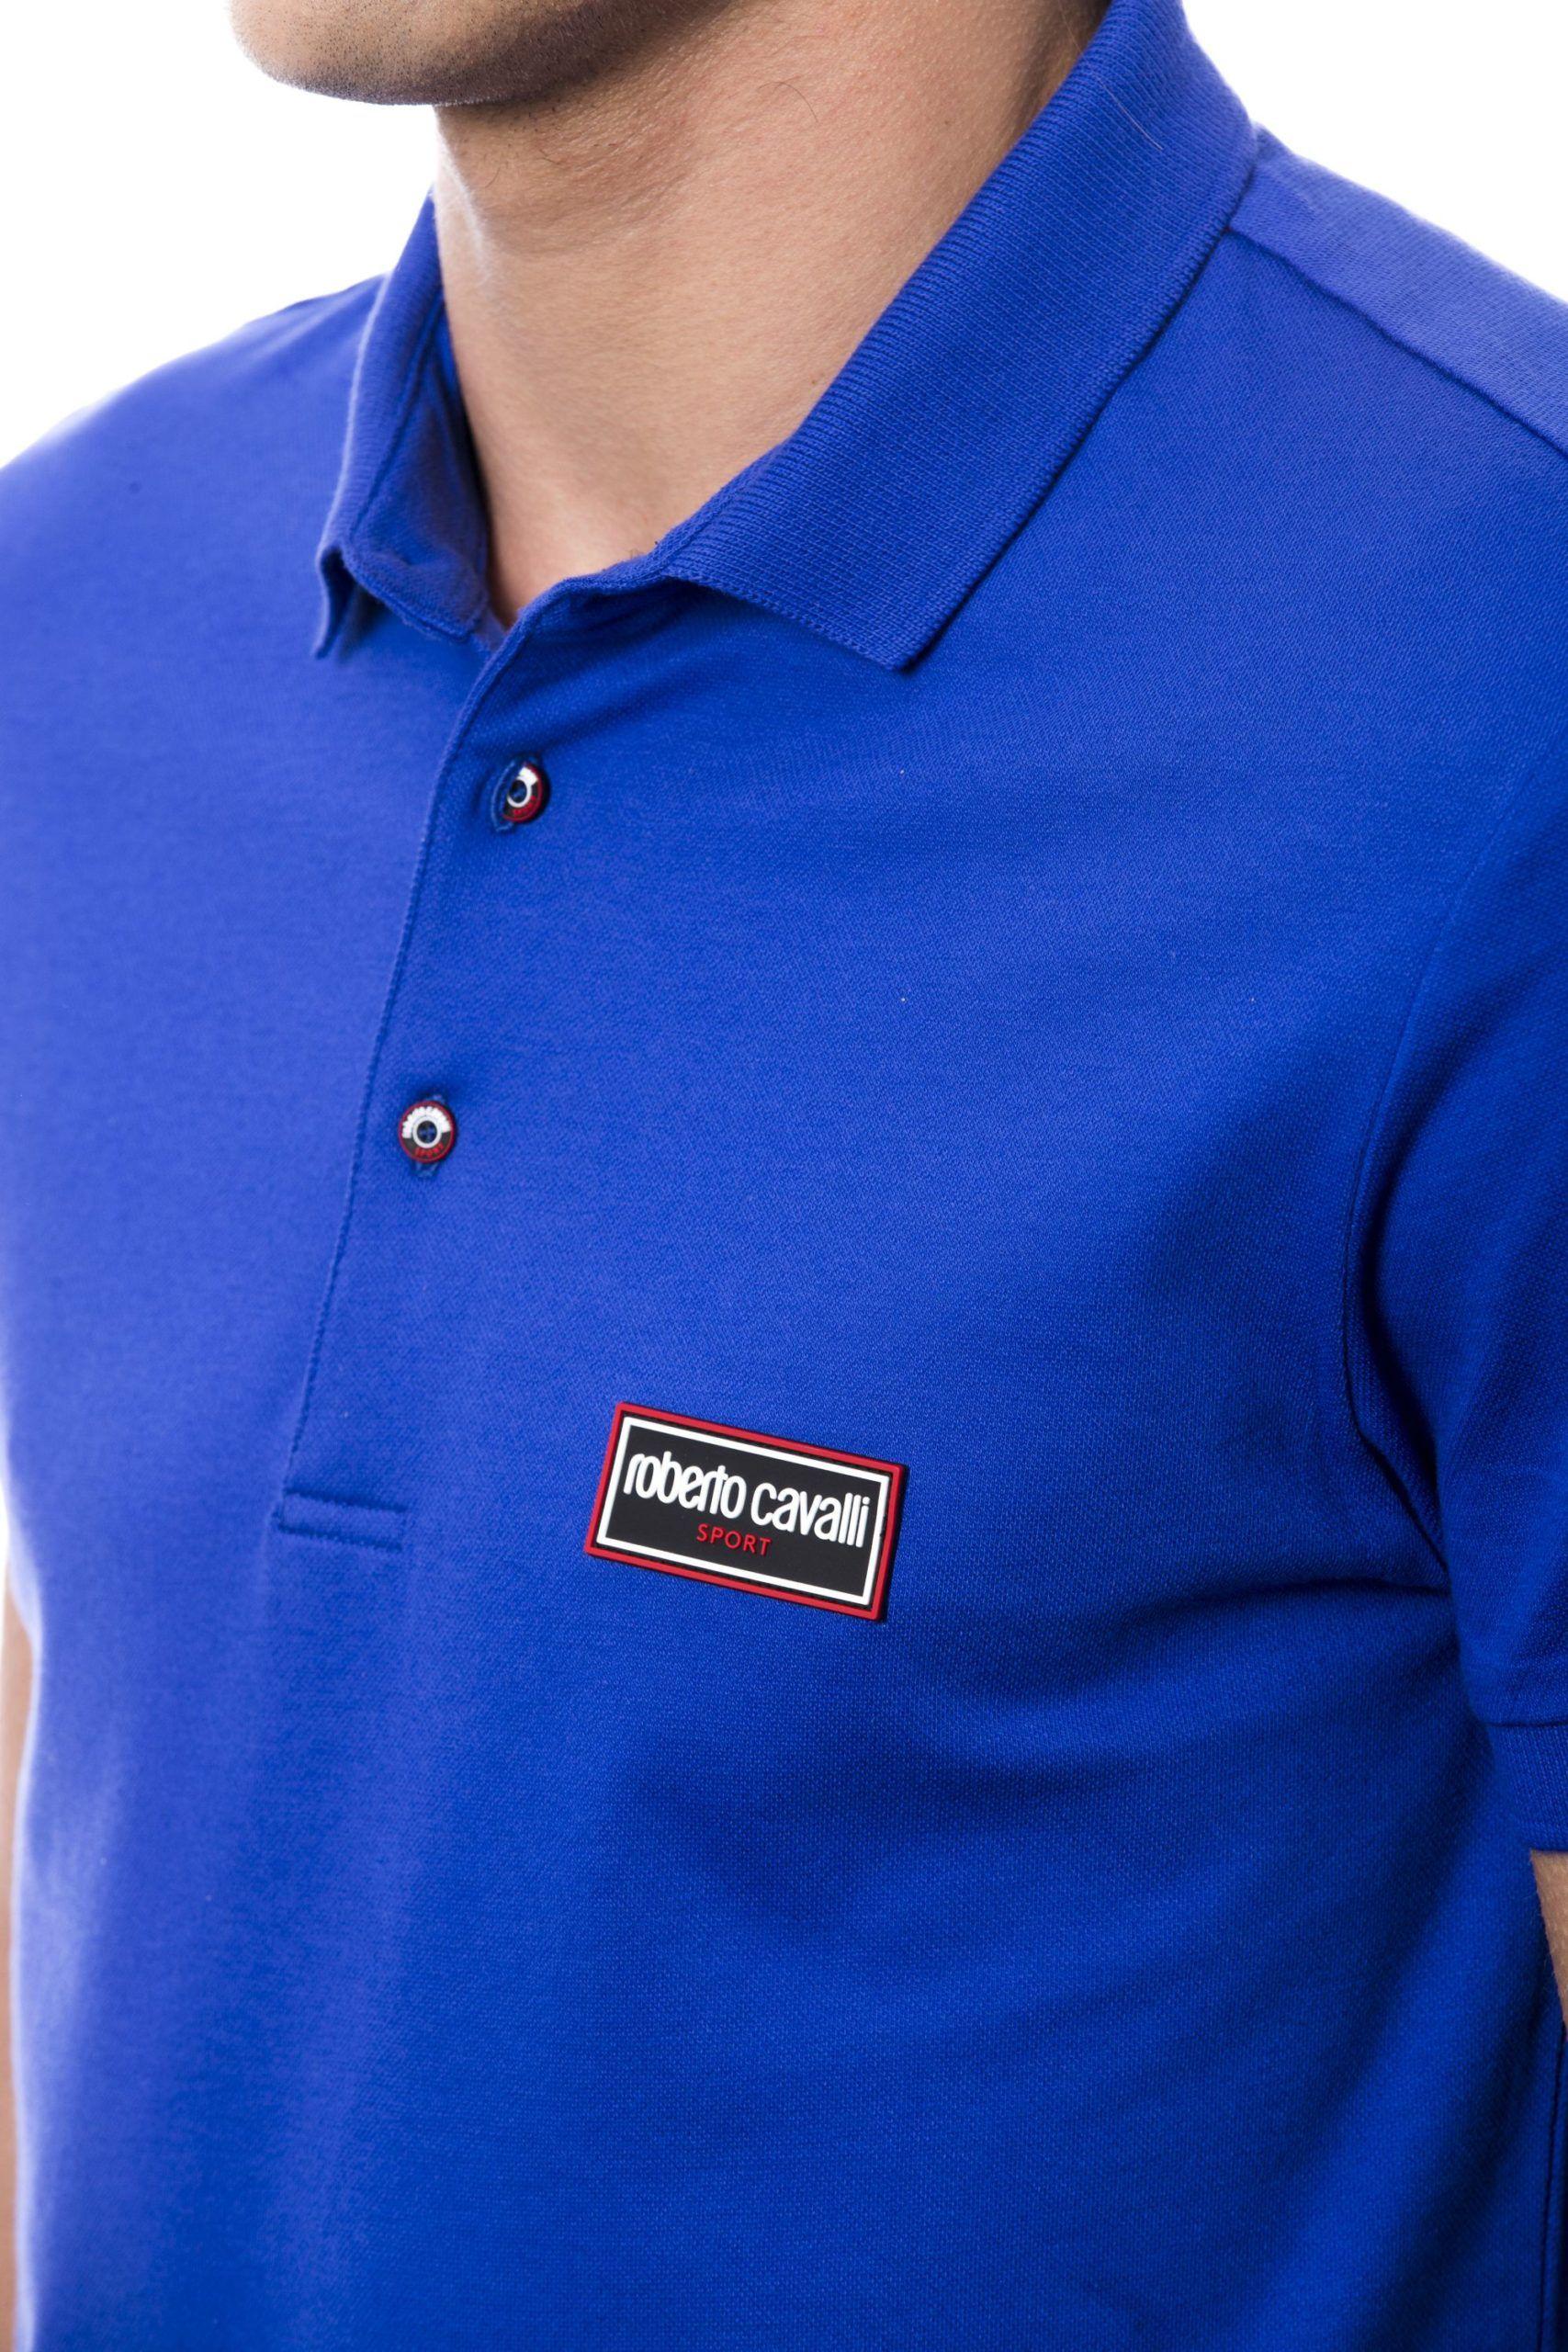 Roberto Cavalli Sport Blue Royal T-shirt